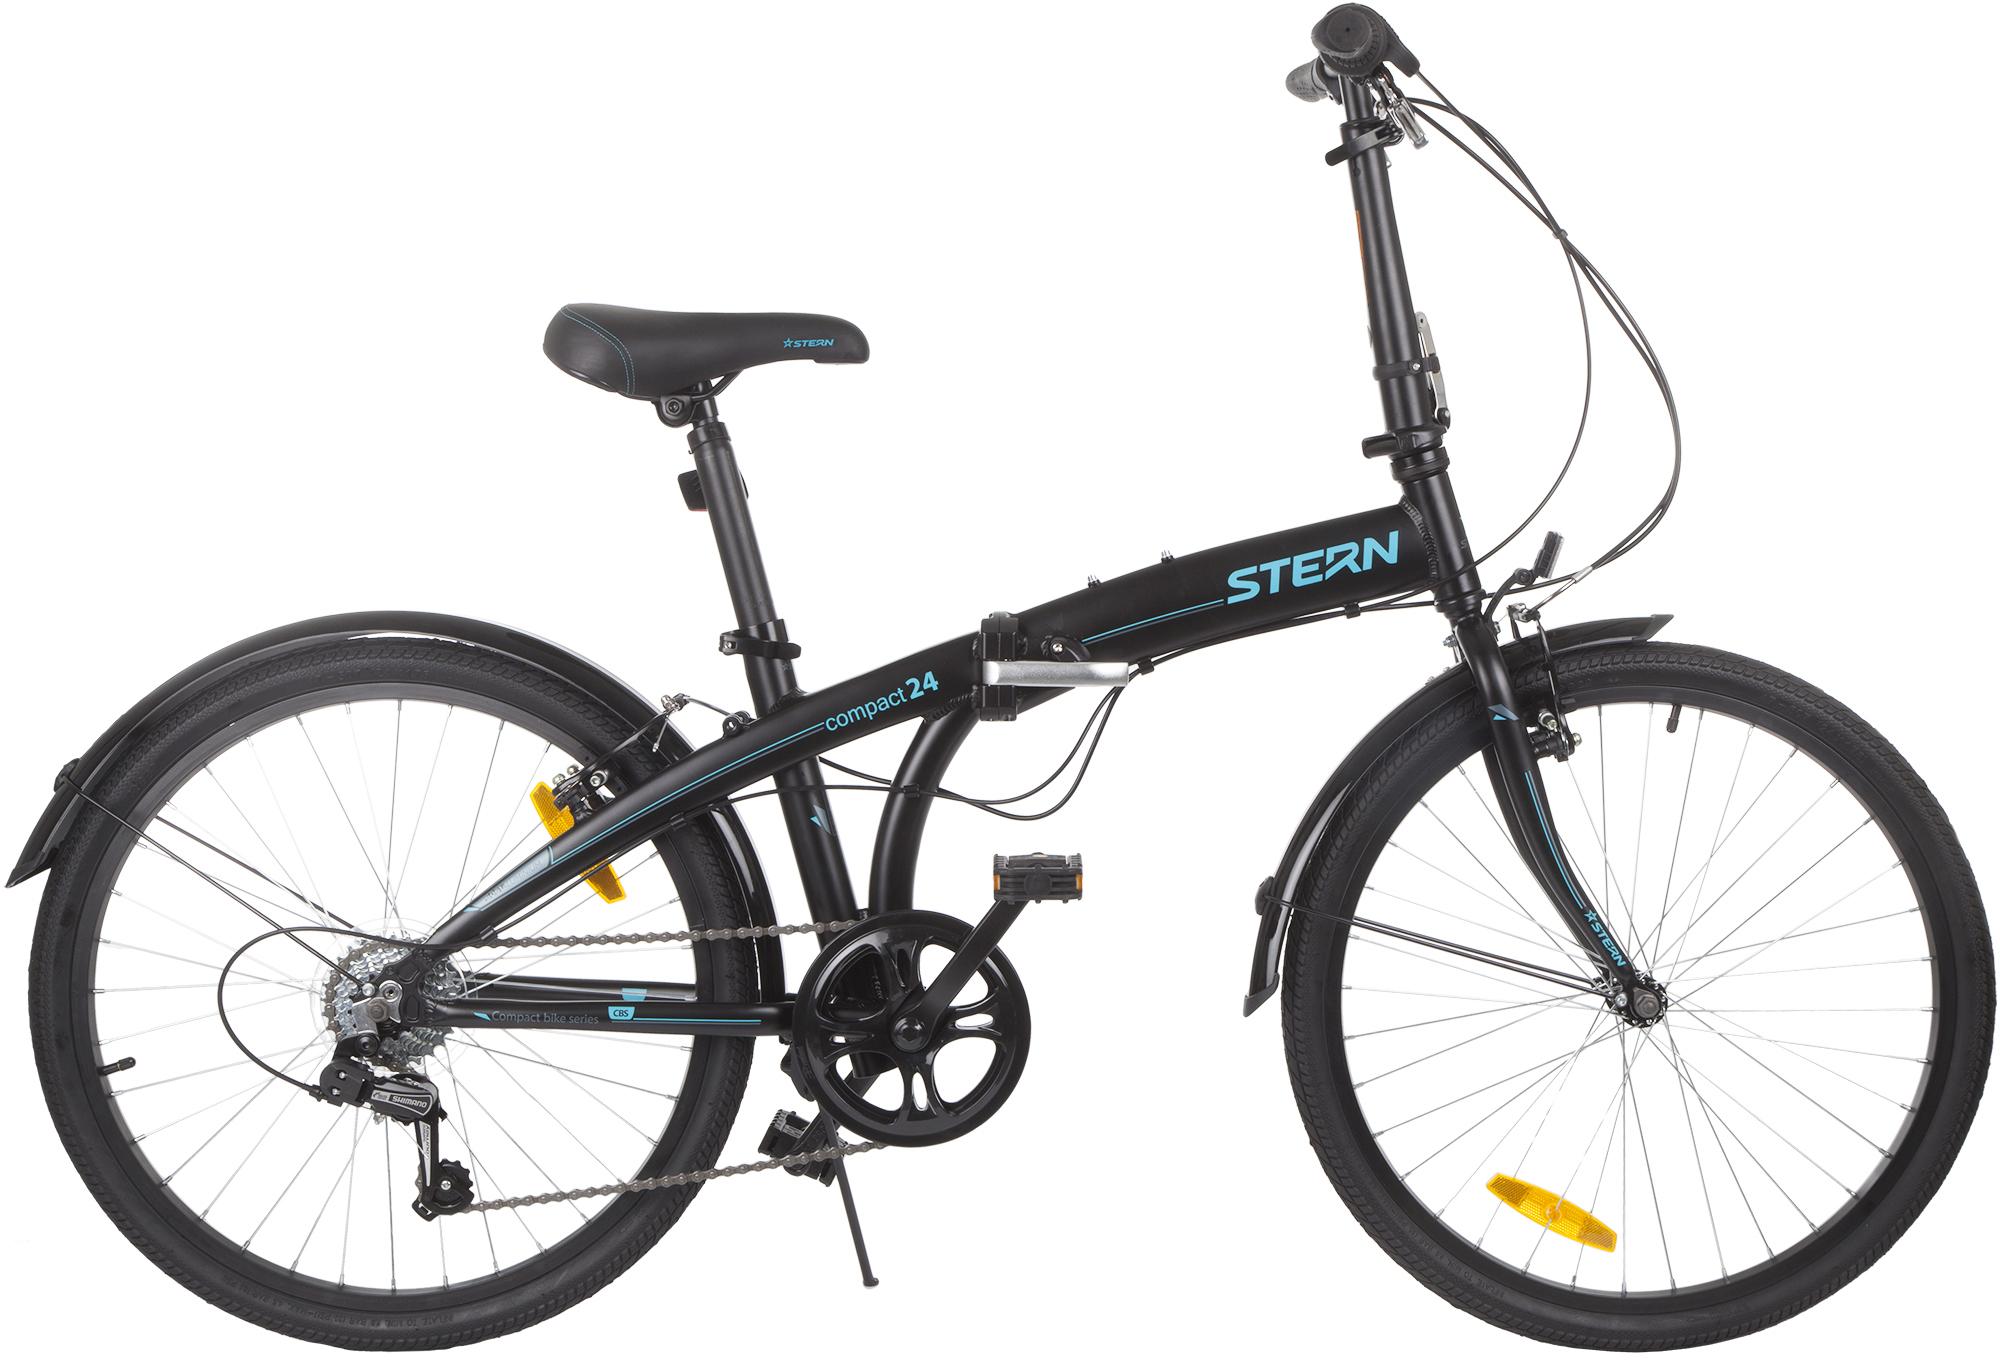 Stern Велосипед складной Stern Compact 24 цена